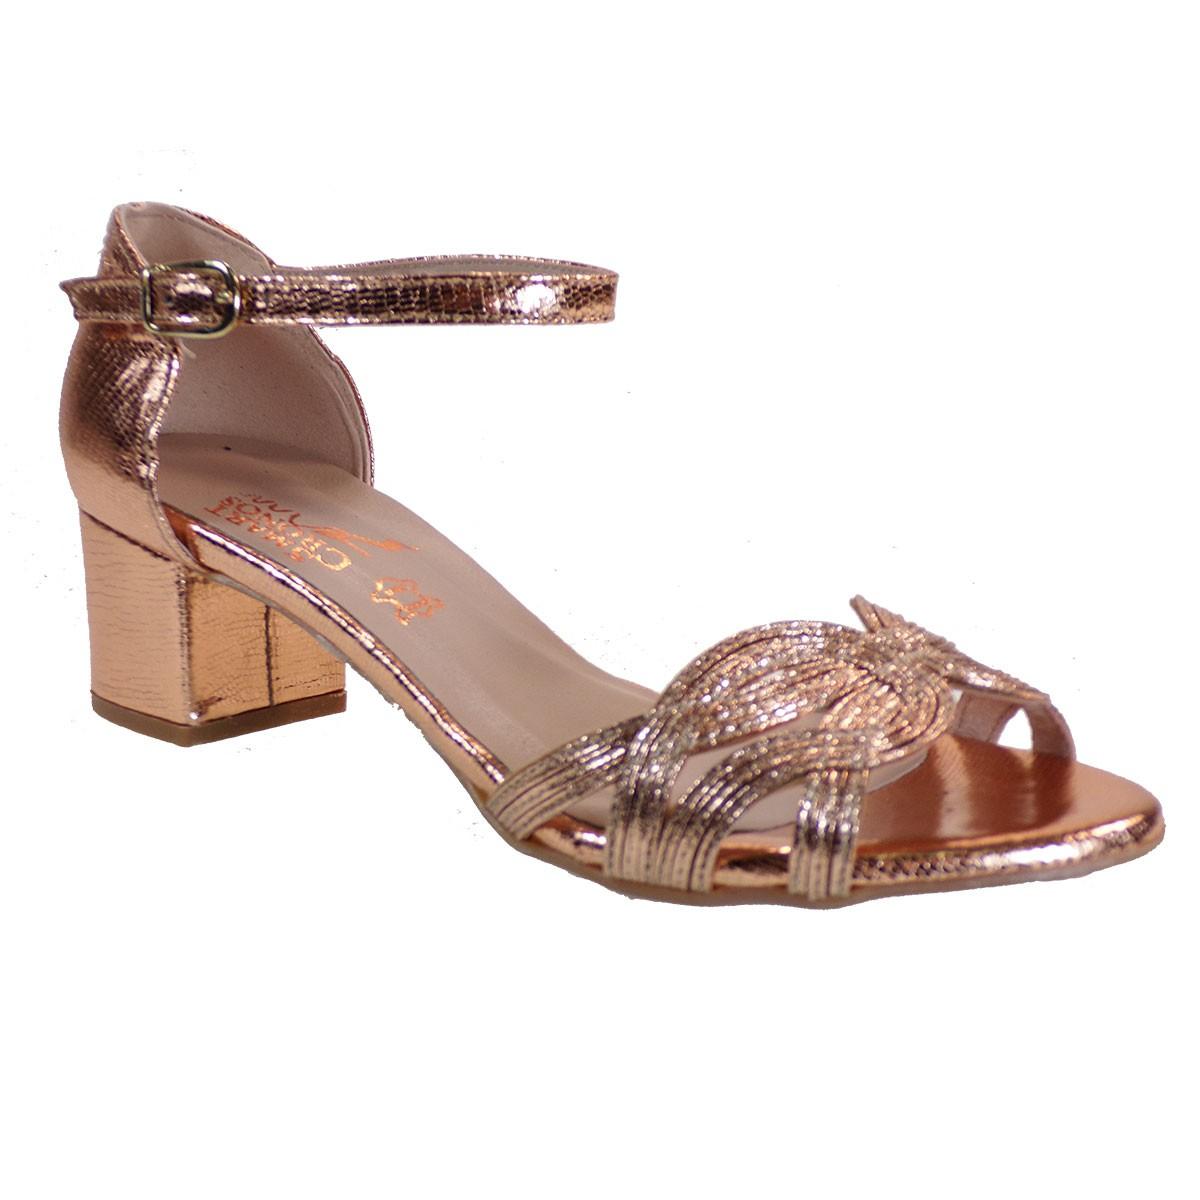 Smart Cronos Γυναικεία Παπούτσια Πέδιλα 7291-3511 Χαλκός